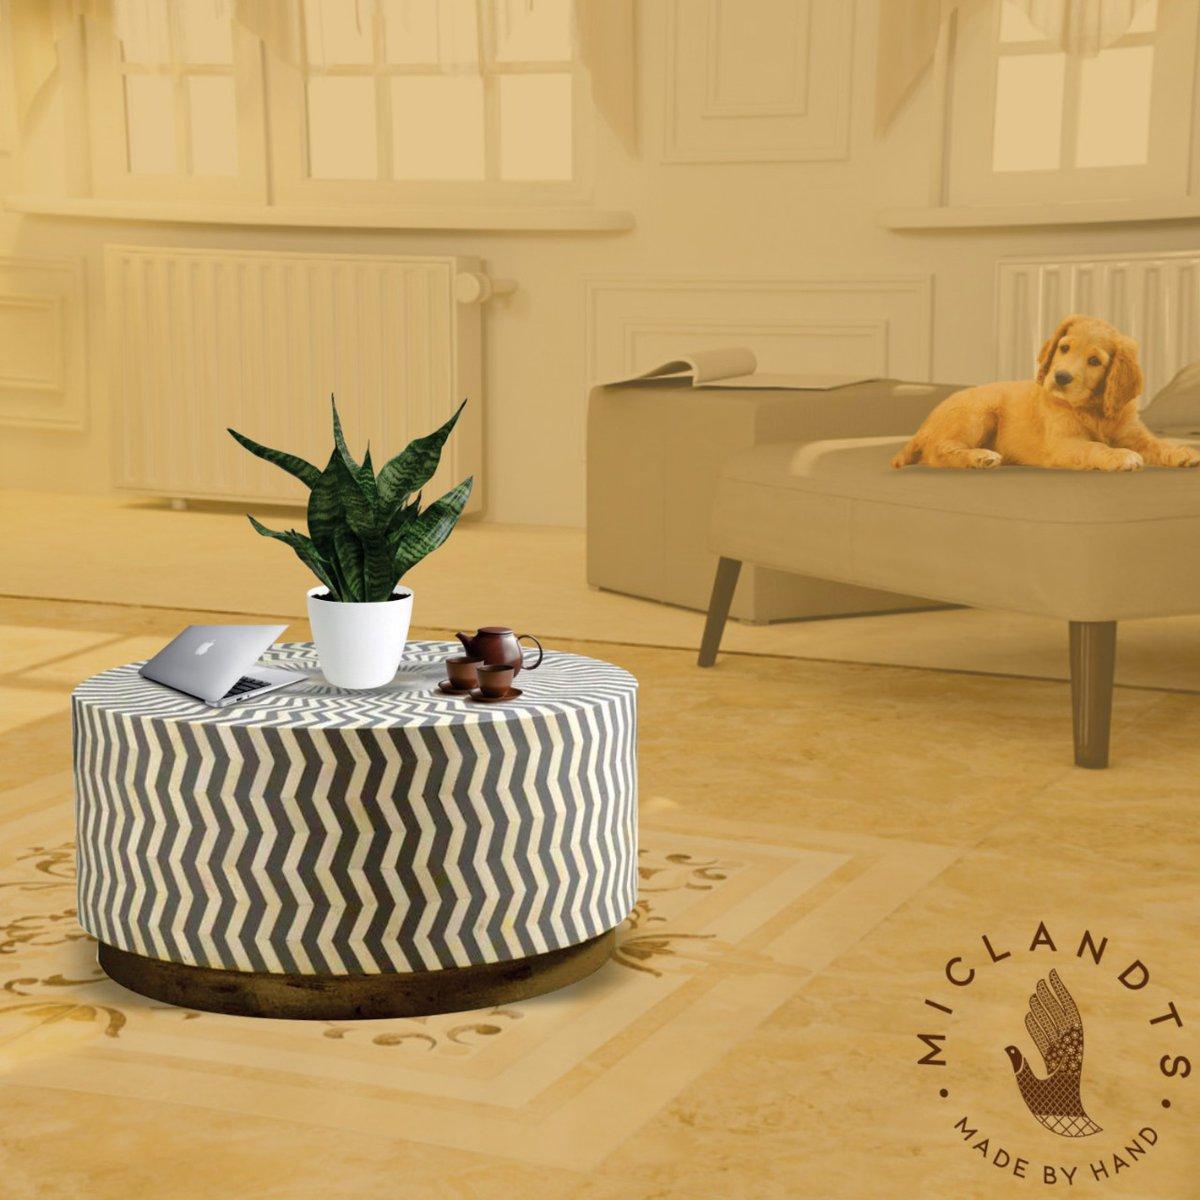 Bone Inlay Coffee Table Design Geometrical Custom Design Custom Colours.  #coffeetable #inlaycoffeetable #boneinlay #motherofpearlinlay #inlay #camelbone #abaloneshell #shell #aspirational #elegance #handcrafted #unique #india #inlayfurniture #inlayhomewar https://t.co/uB66uUrmv1